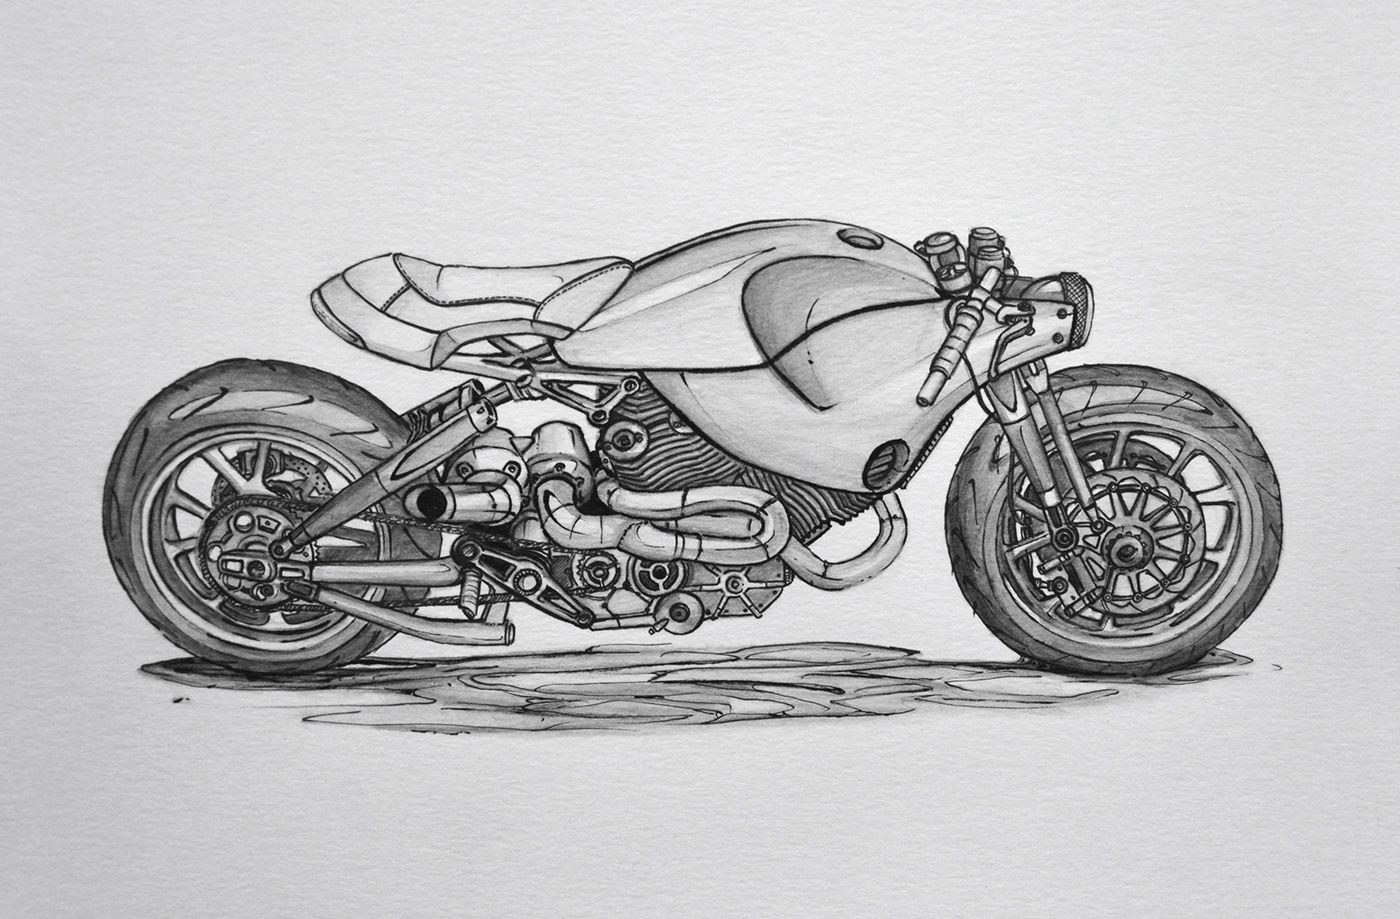 MOTORCYCLE - Sketchbook (design concepts) on Behance